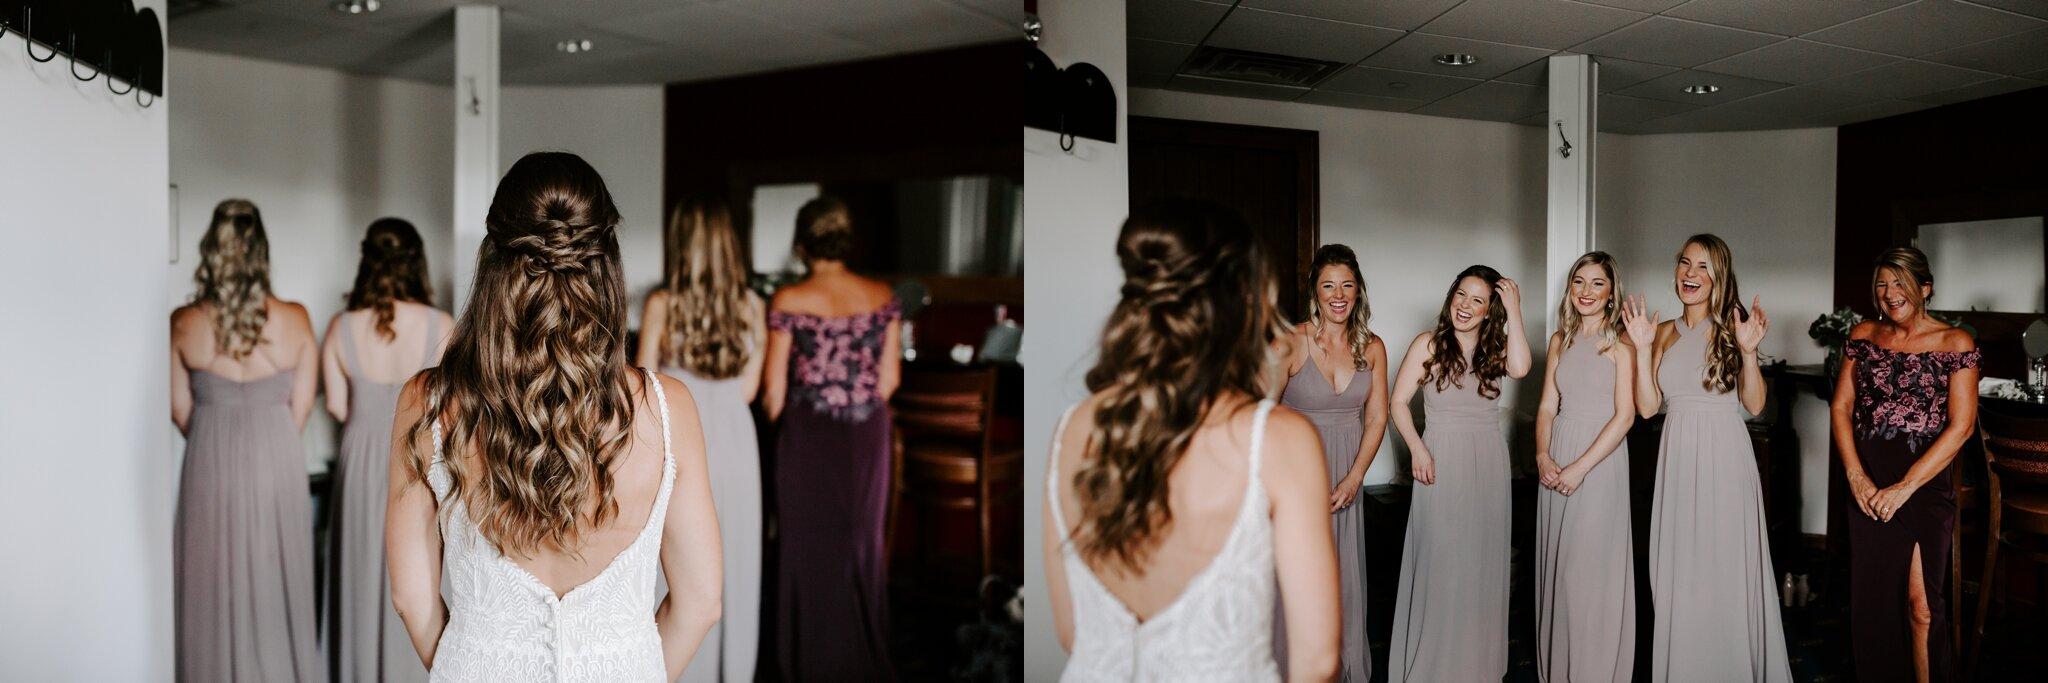 asheville-north-carolina-wedding-photographer_2677.jpg